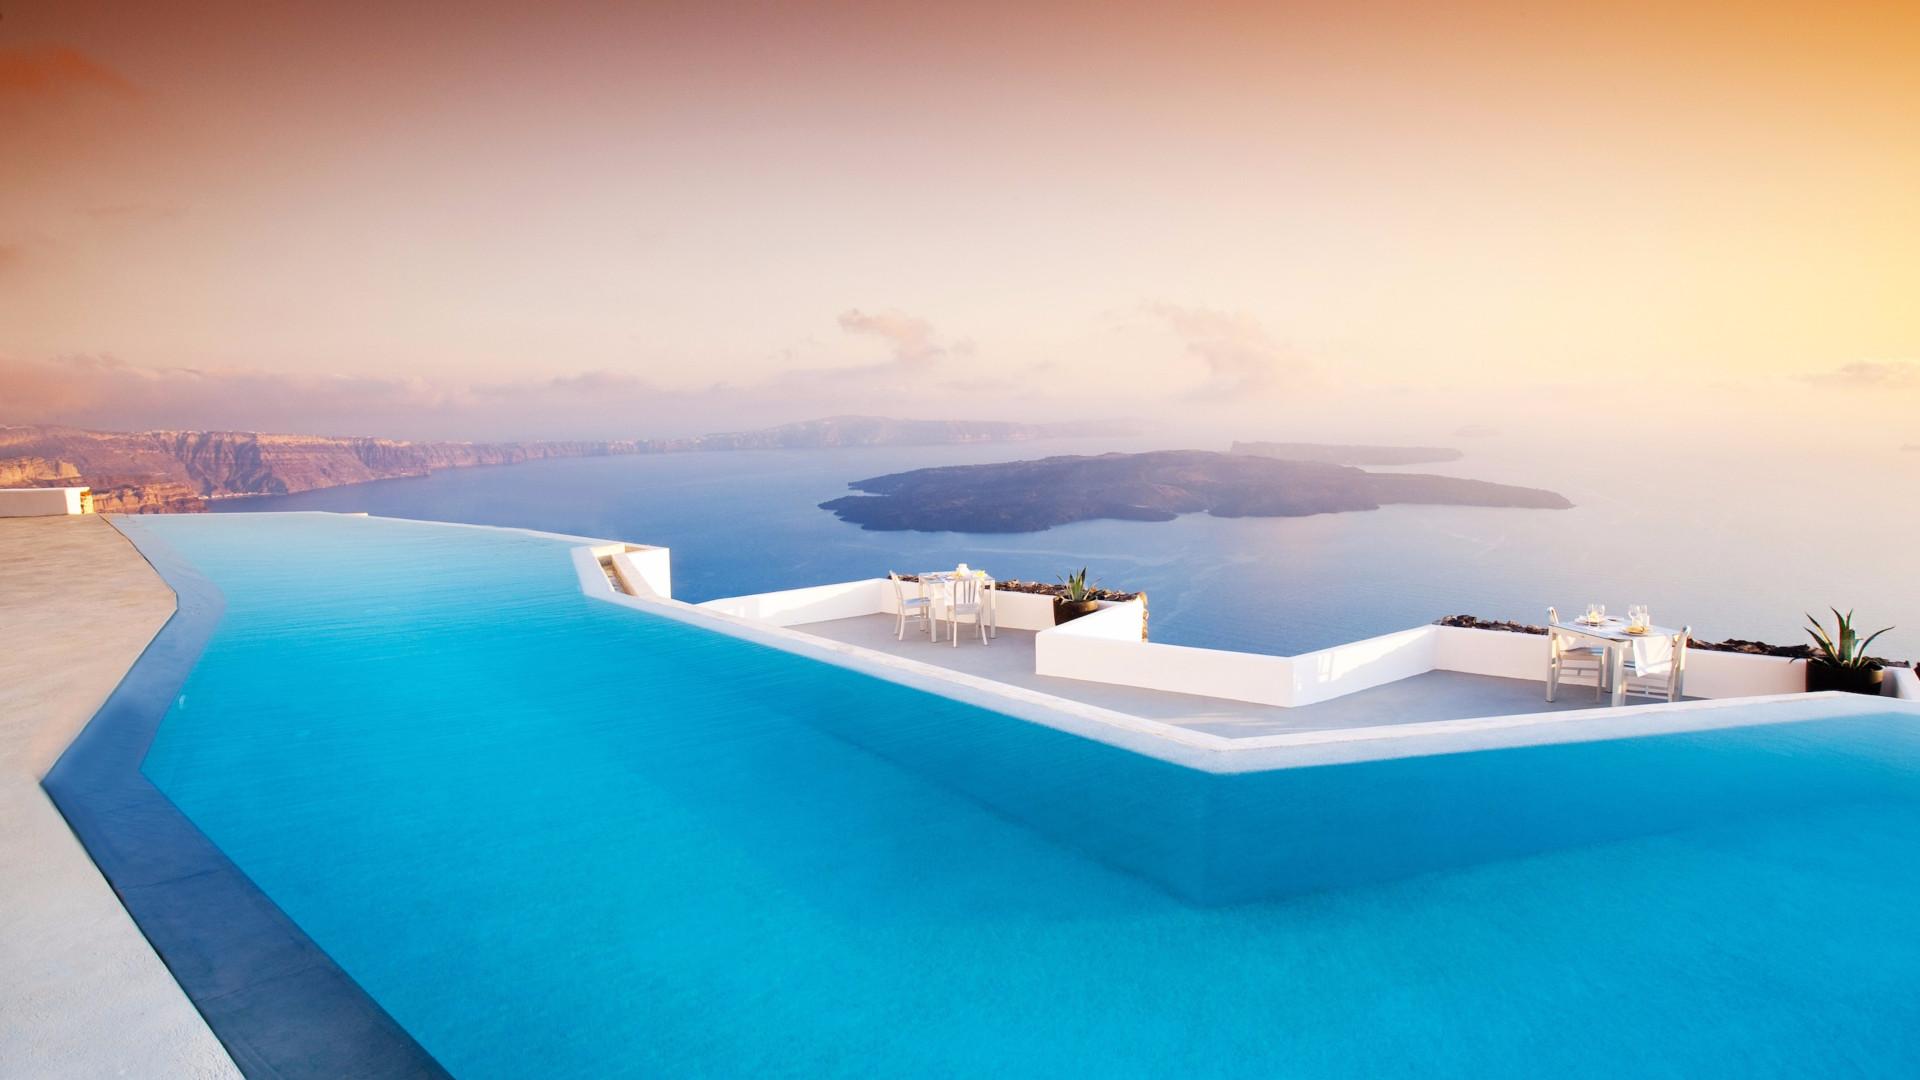 Not cias ao minuto estas s o as piscinas infinitas mais for Fotos de piscinas climatizadas